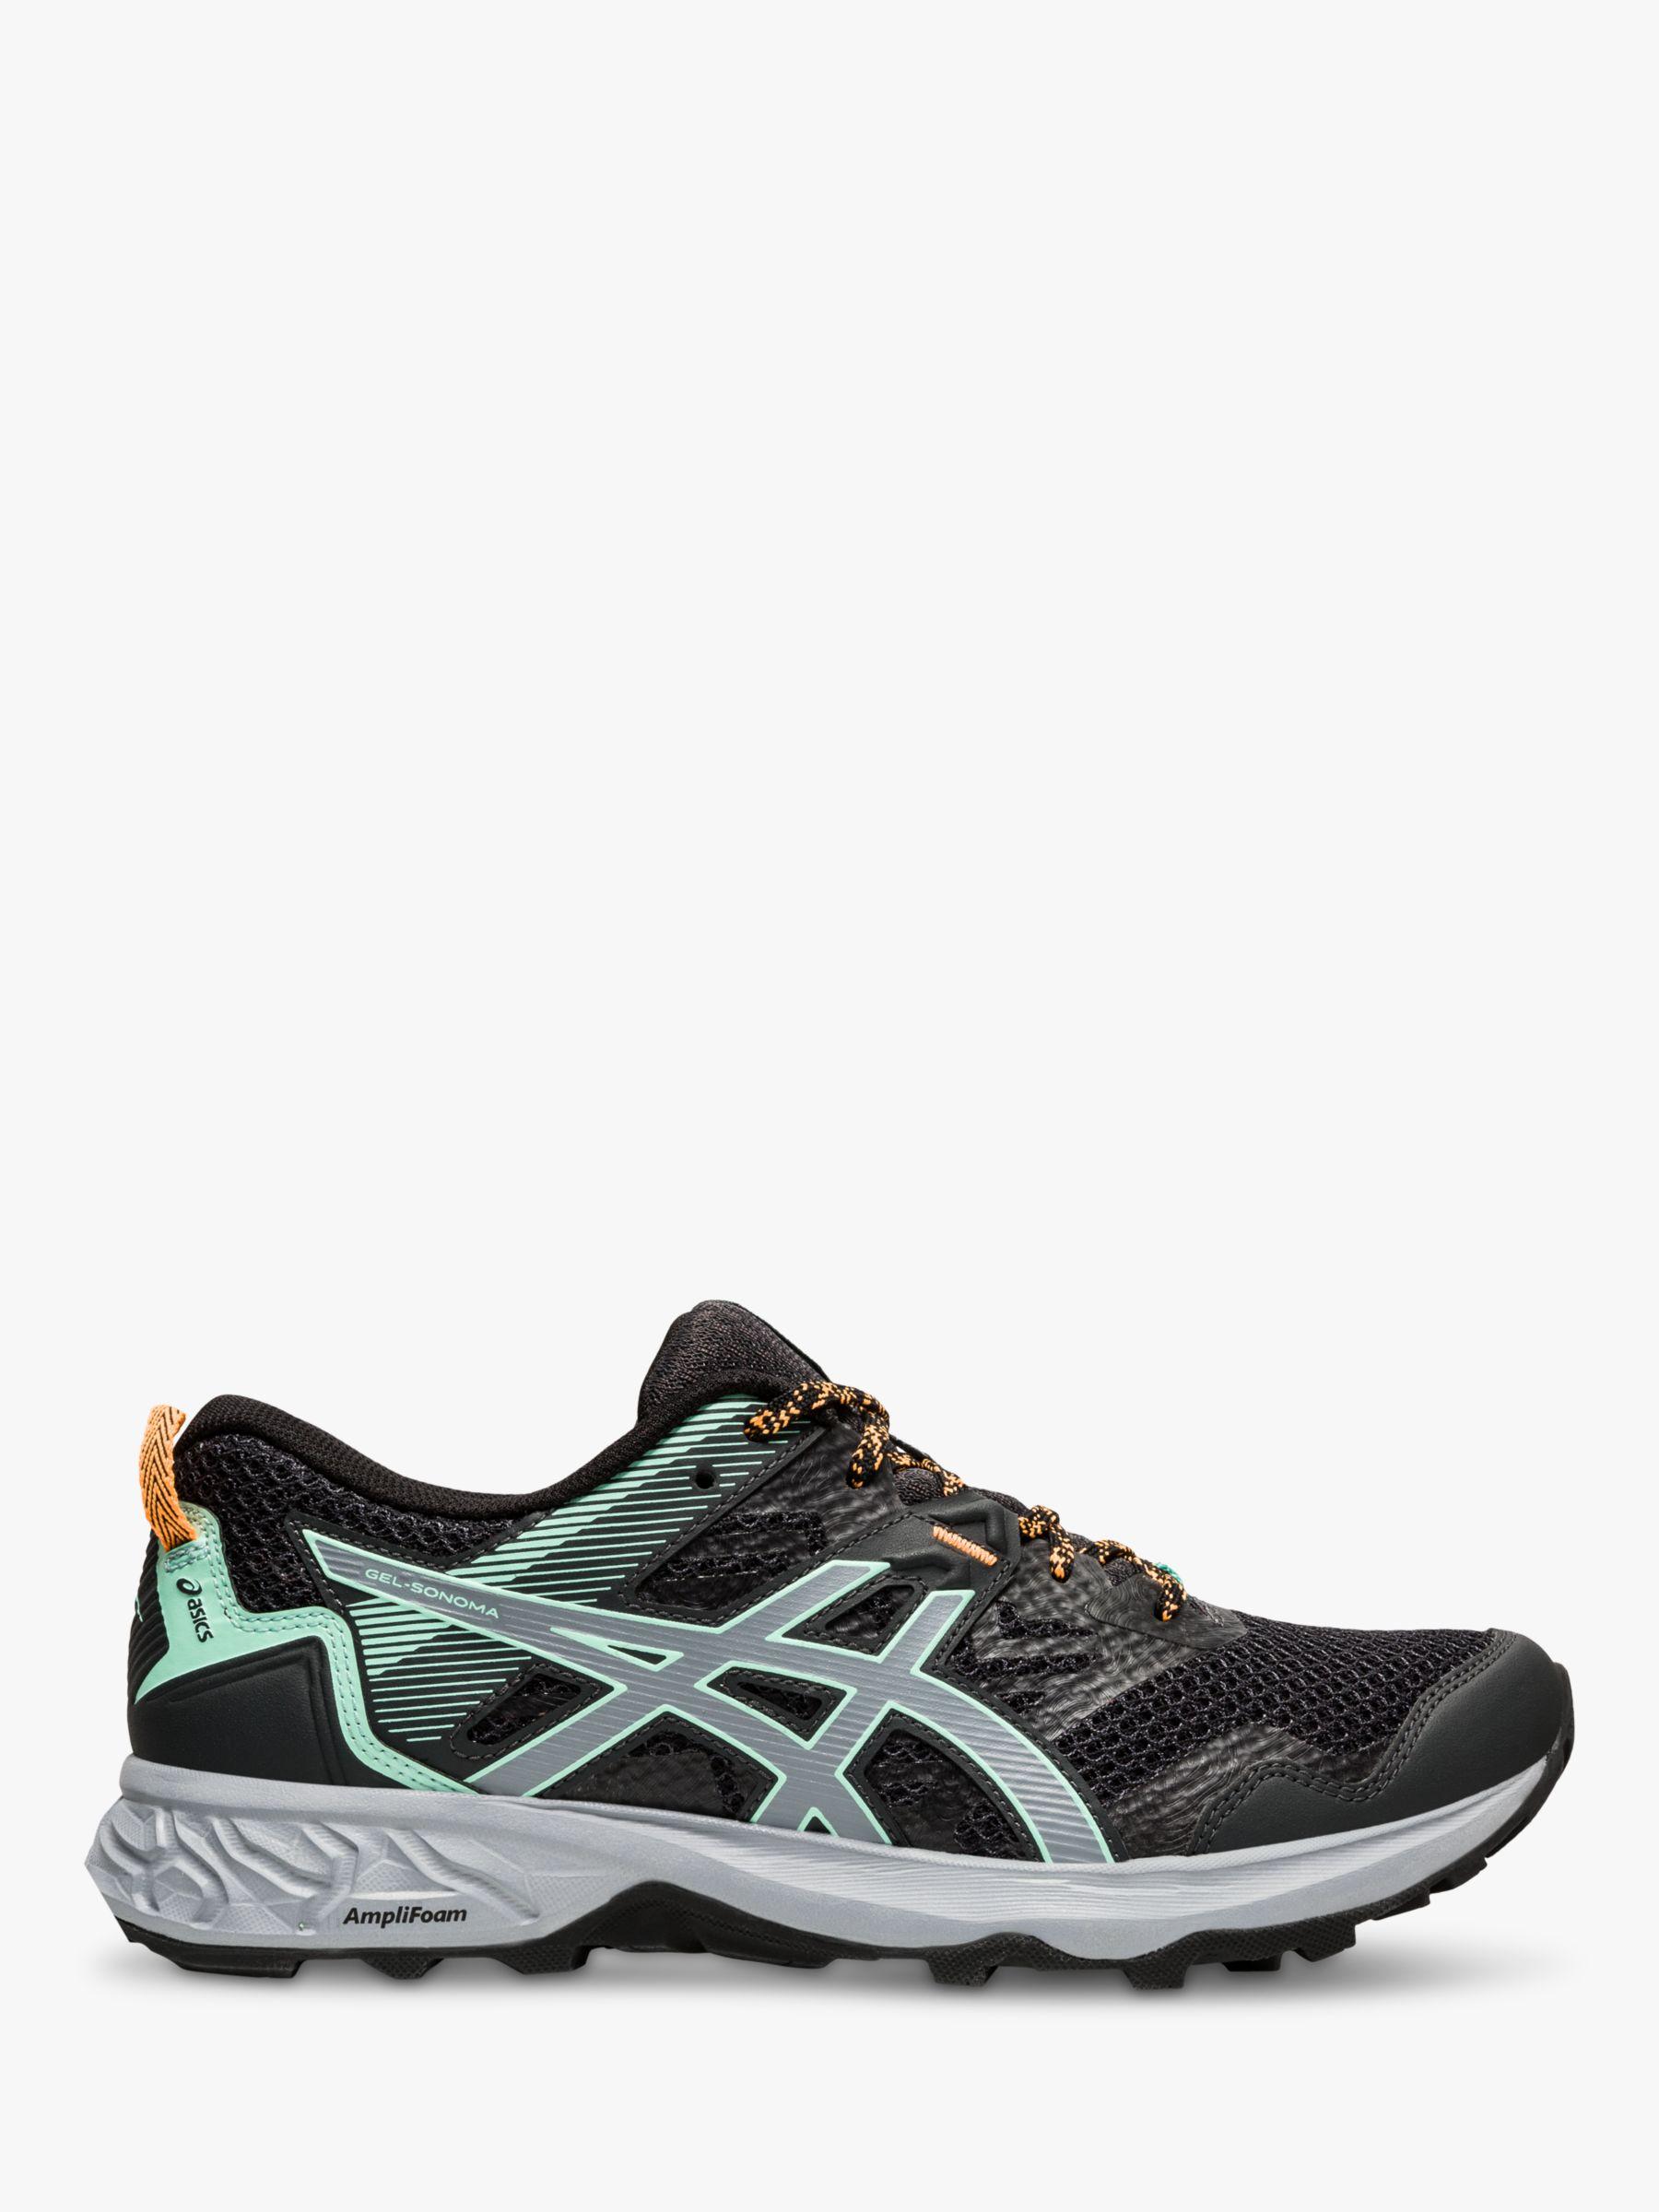 ASICS ASICS GEL-SONOMA 5 Women's Trail Running Shoes, Graphite Grey/Sheet Rock